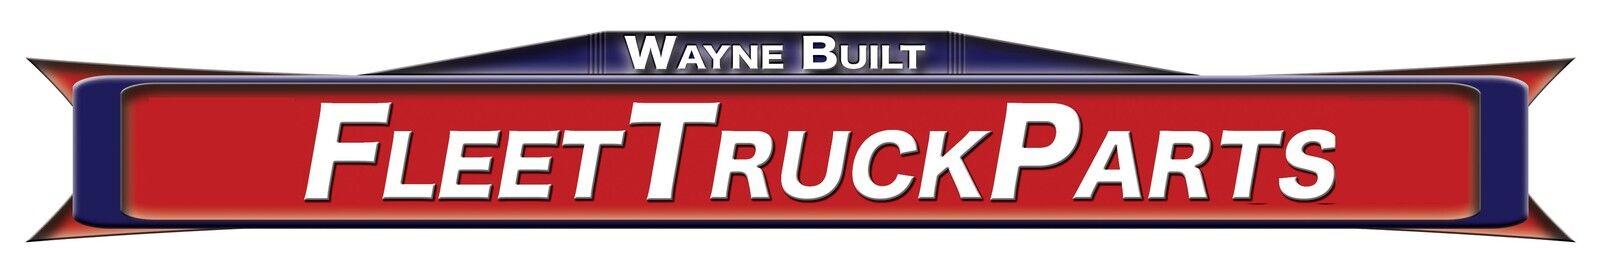 Fleet Truck Parts